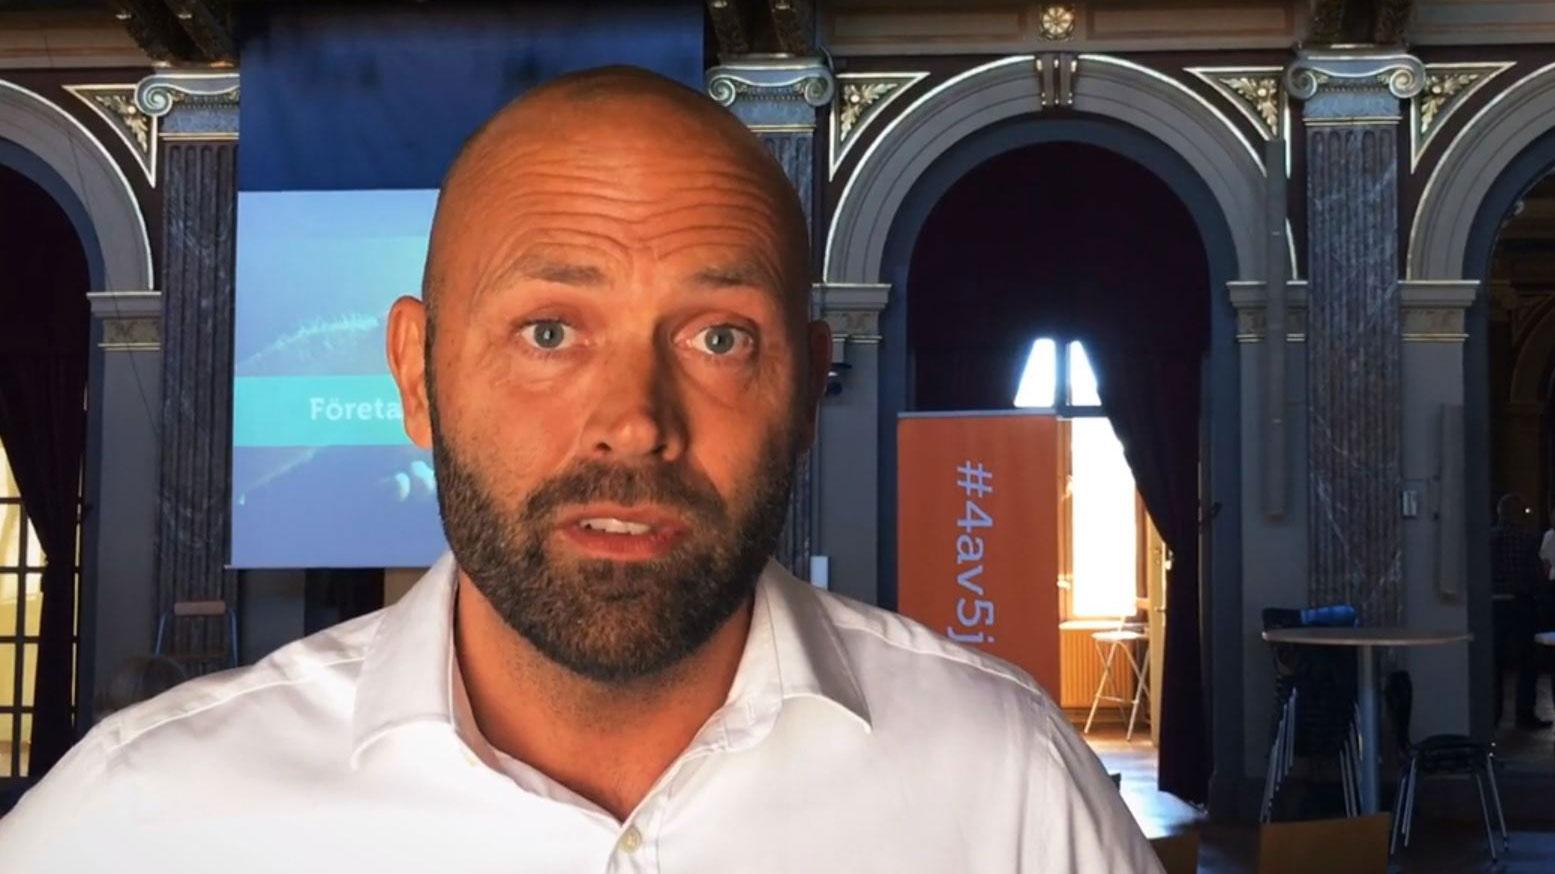 Gävle kommuns näringslivschef Johan Tunhult